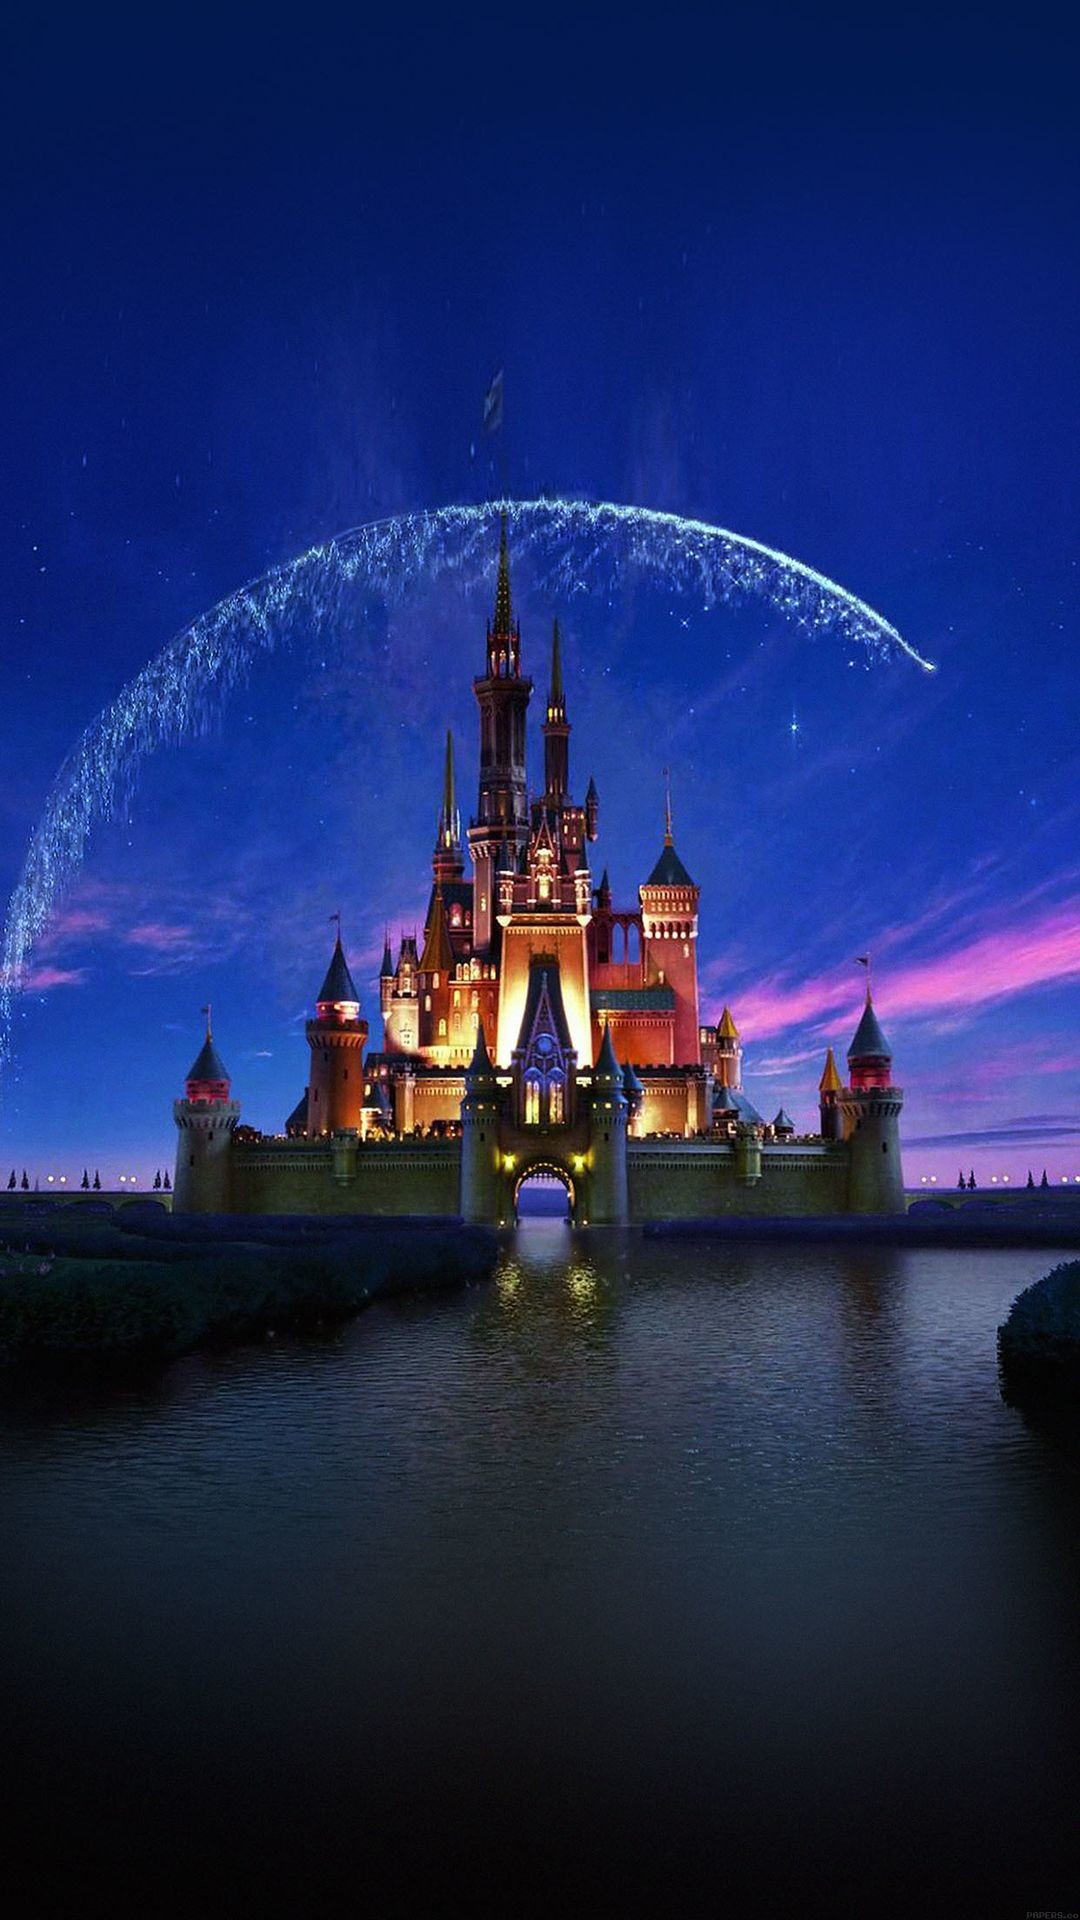 Disney Backgrounds 65 Images